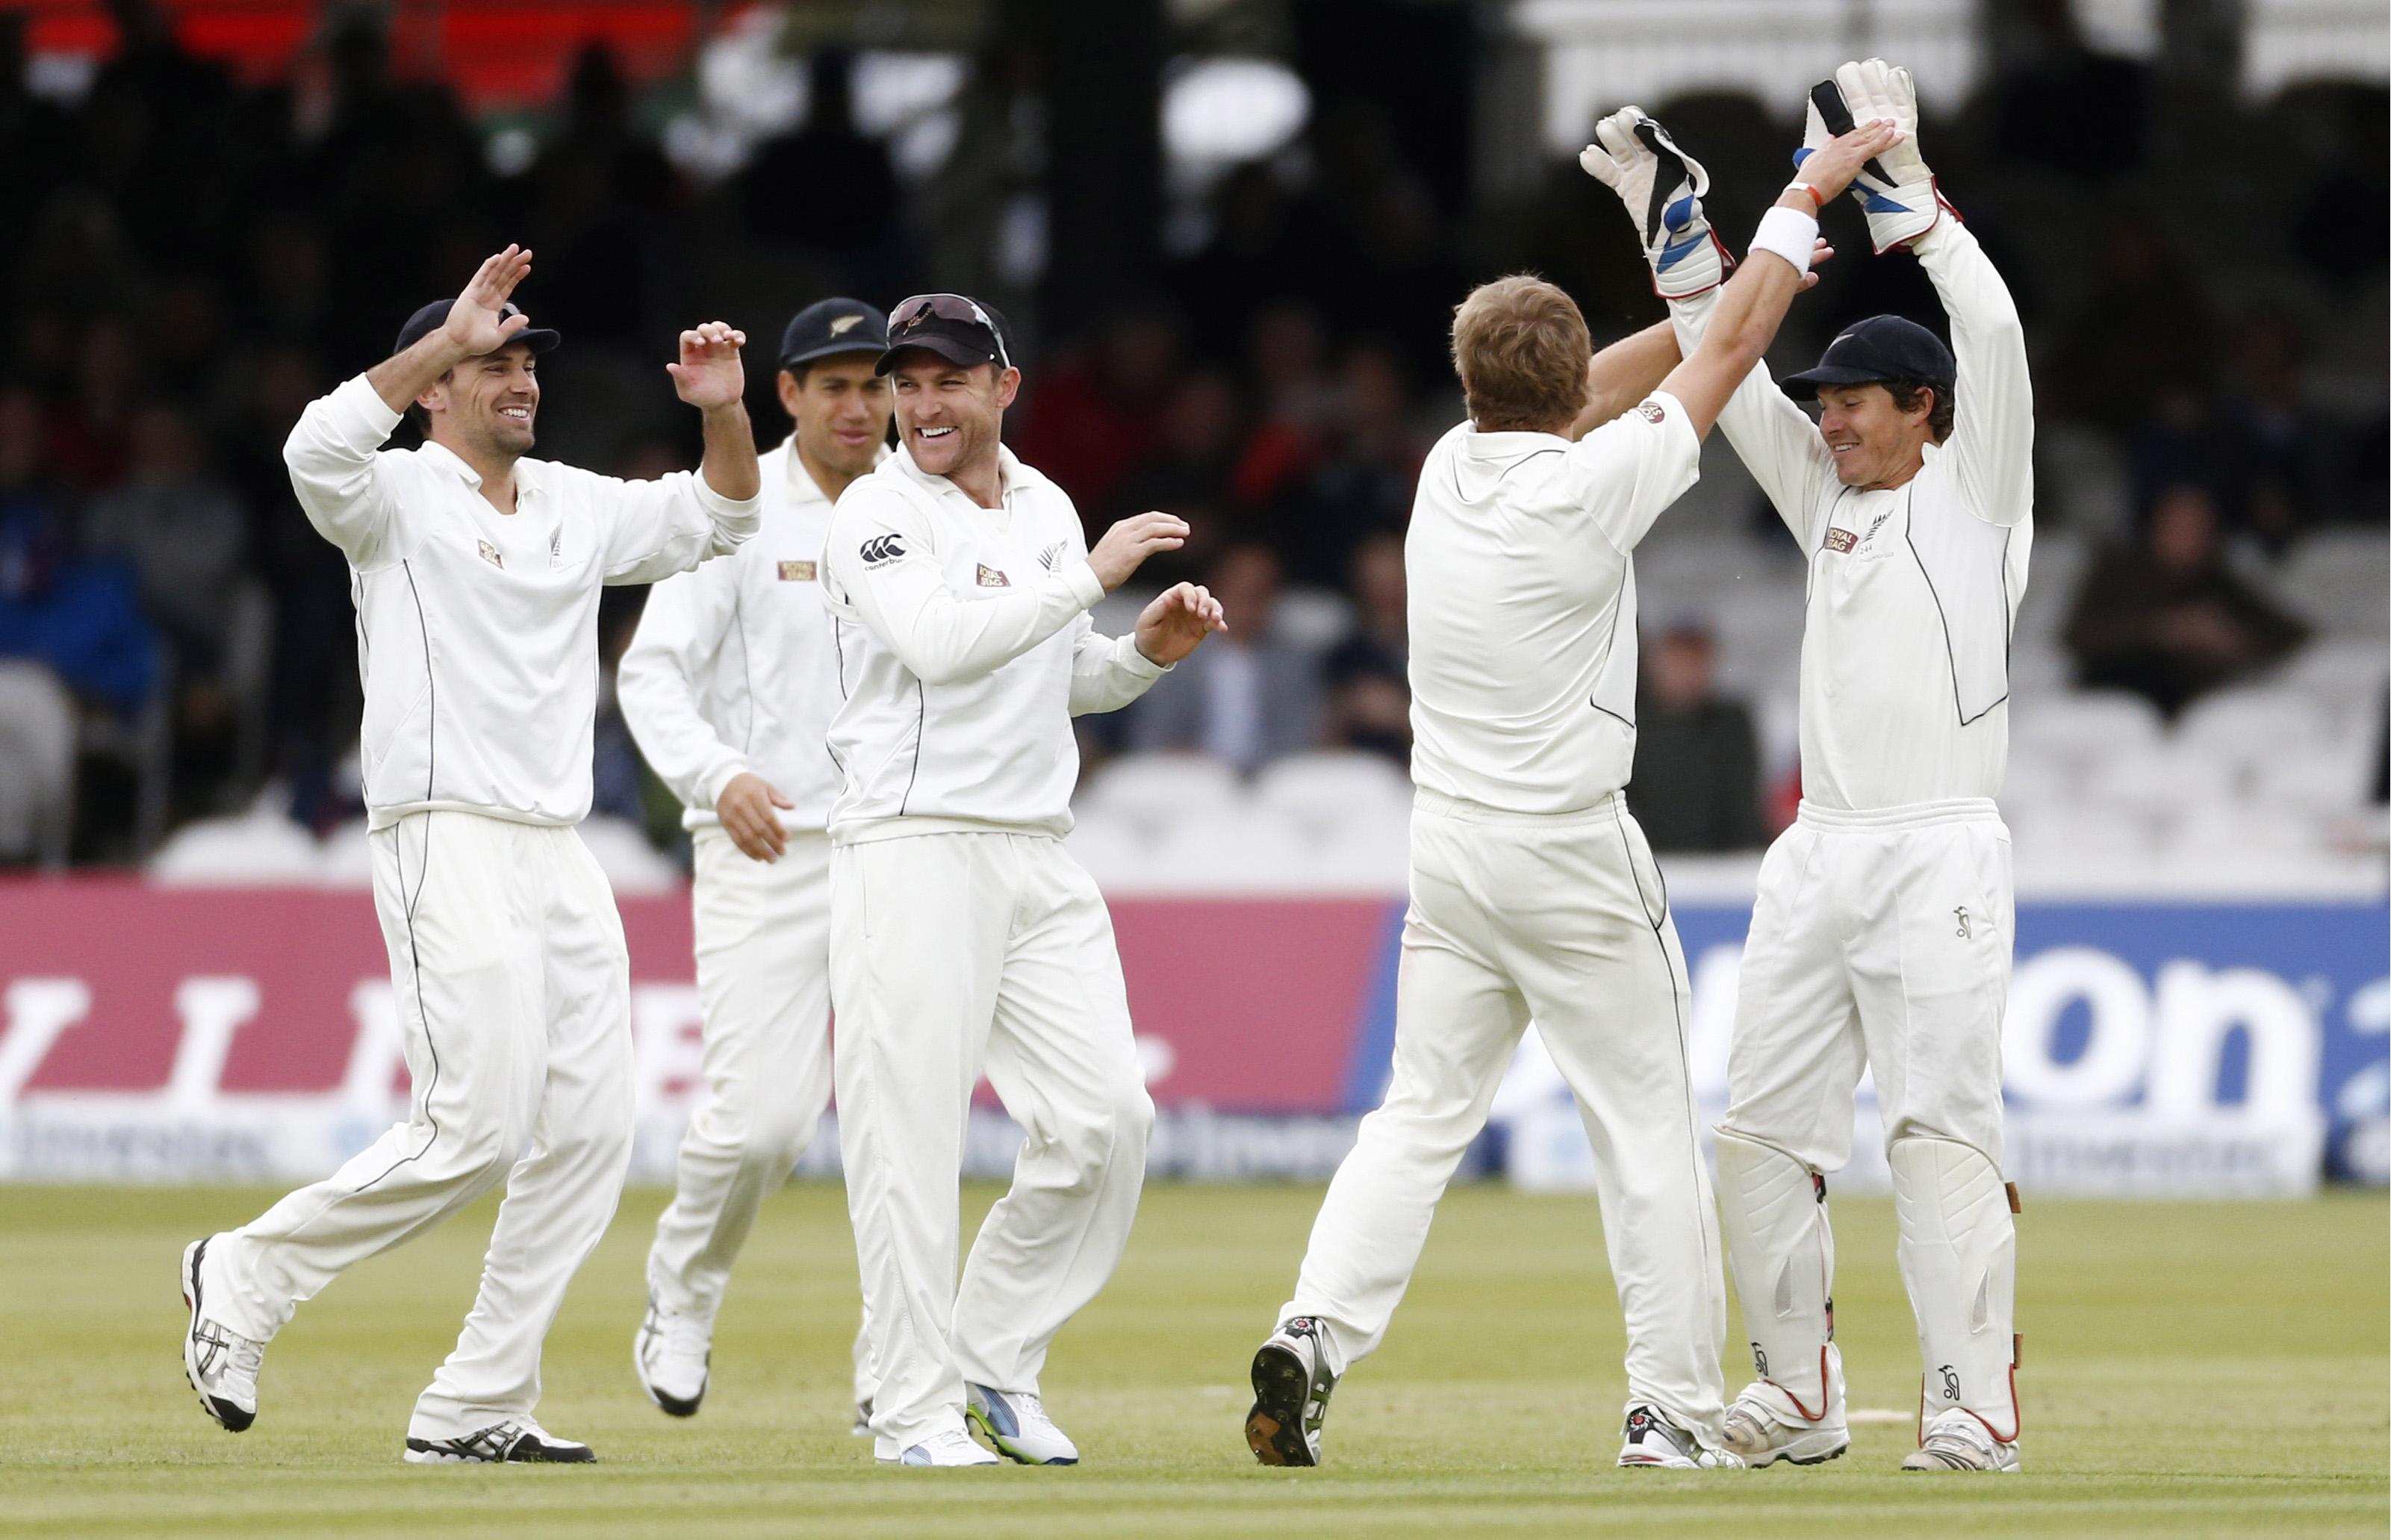 आईसीसी टेस्ट रैंकिंग- न्यूजीलैंड के तेज गेंदबाज नील वेगनर की अभूतपूर्व छलांग, तो विराट कोहली की बढ़ी चिंता 15